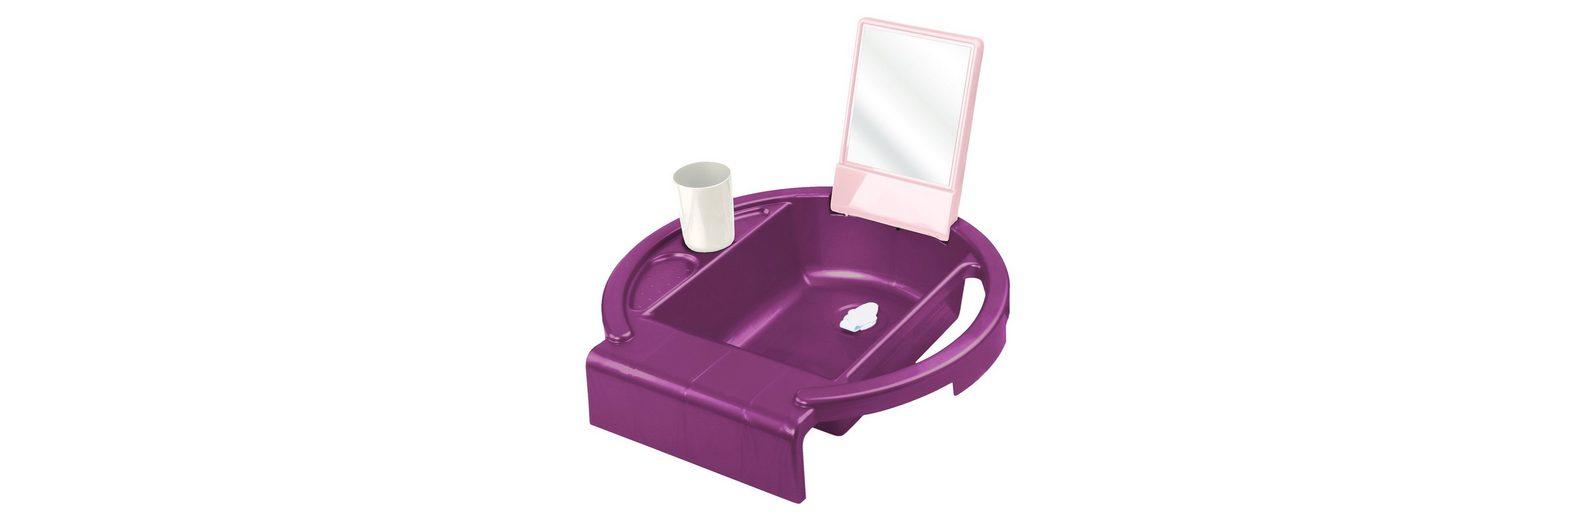 Rotho Babydesign Kiddy Wash, cassis perl